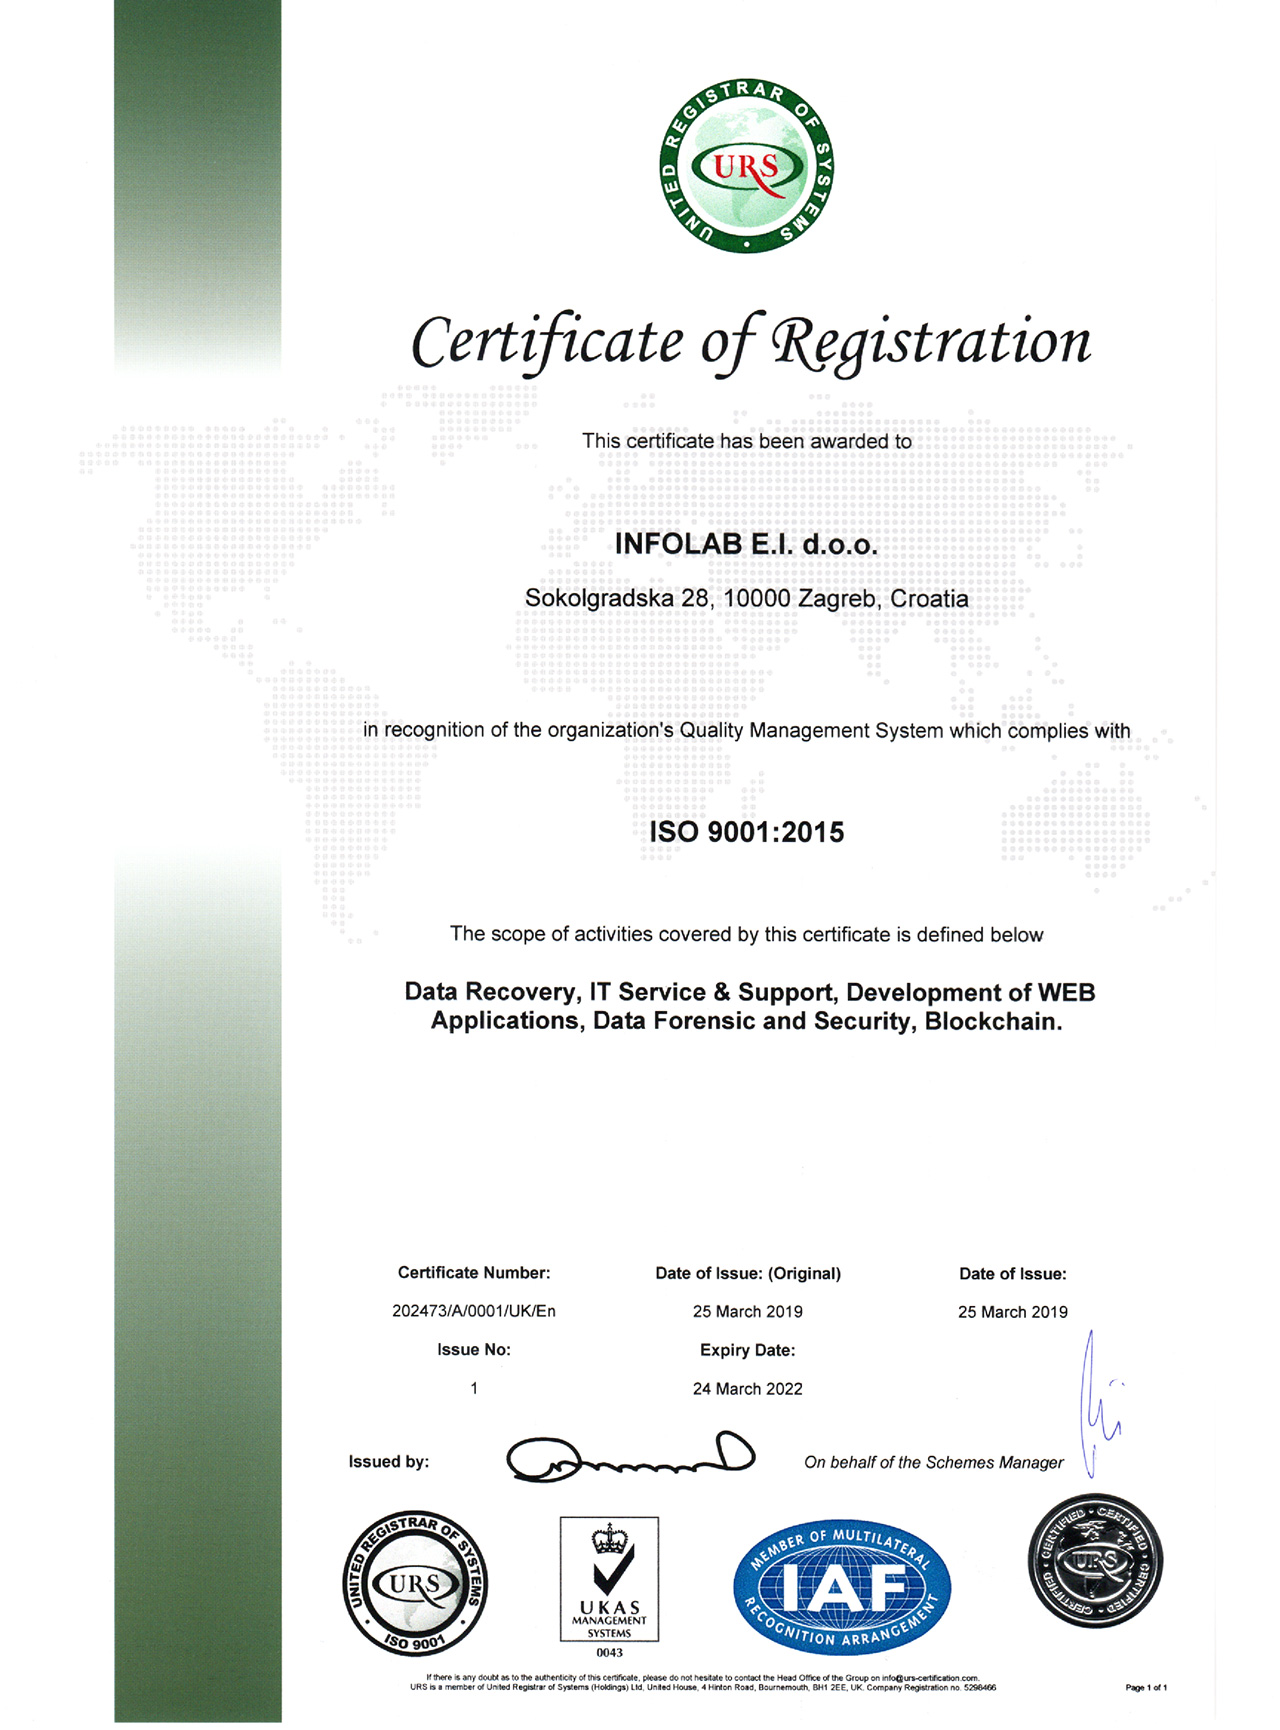 INFOLAB certifikat